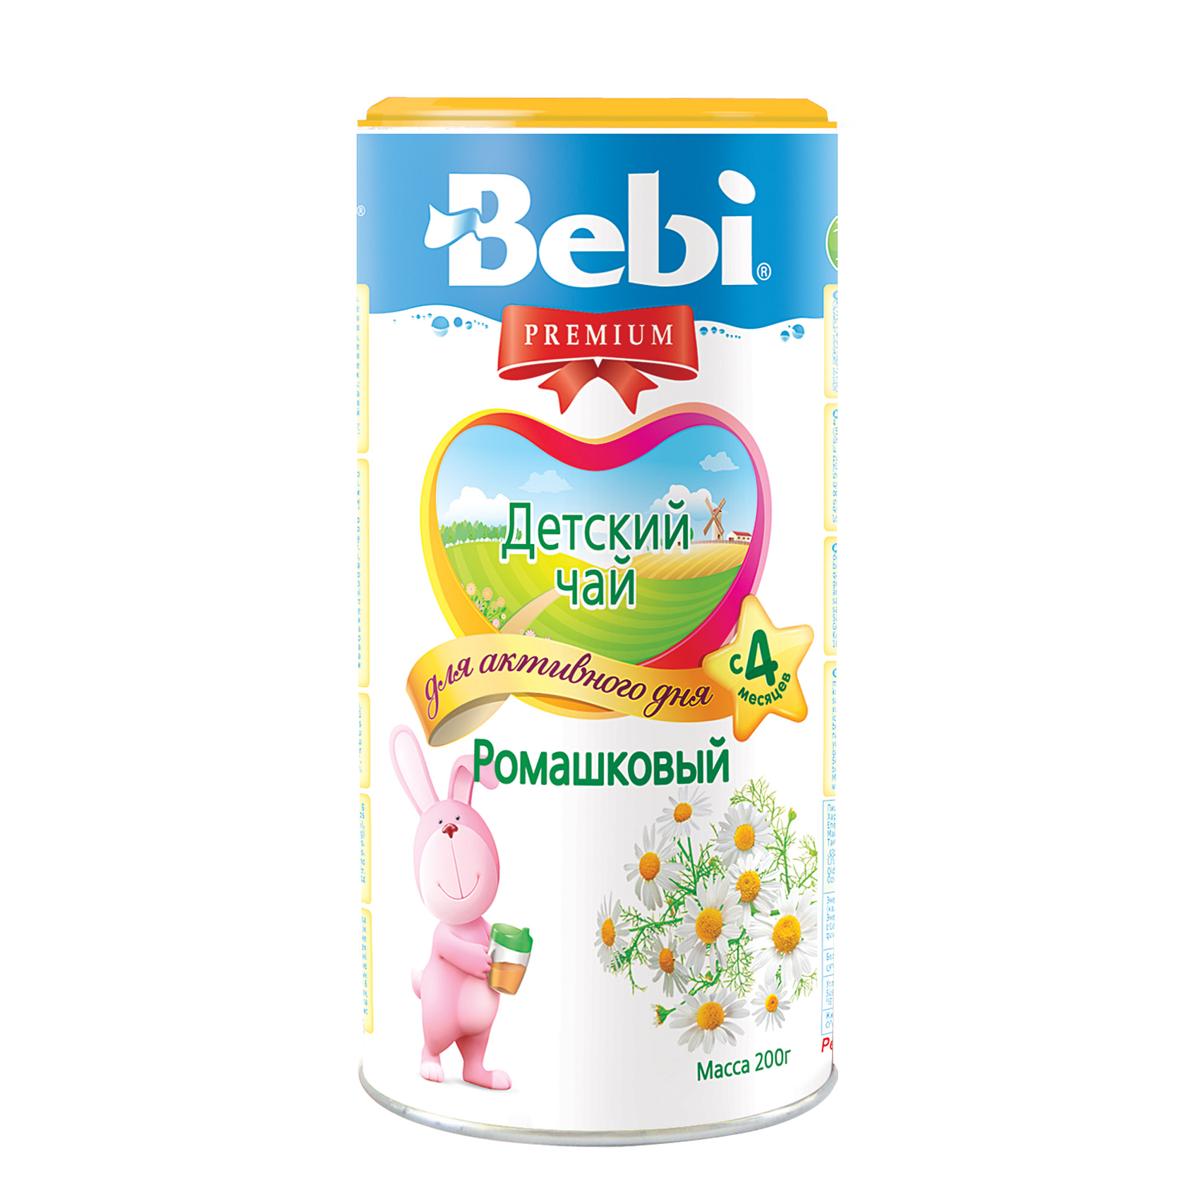 ��� ������� Bebi Premium ���������� 200 �� ������� (� 4 ���)